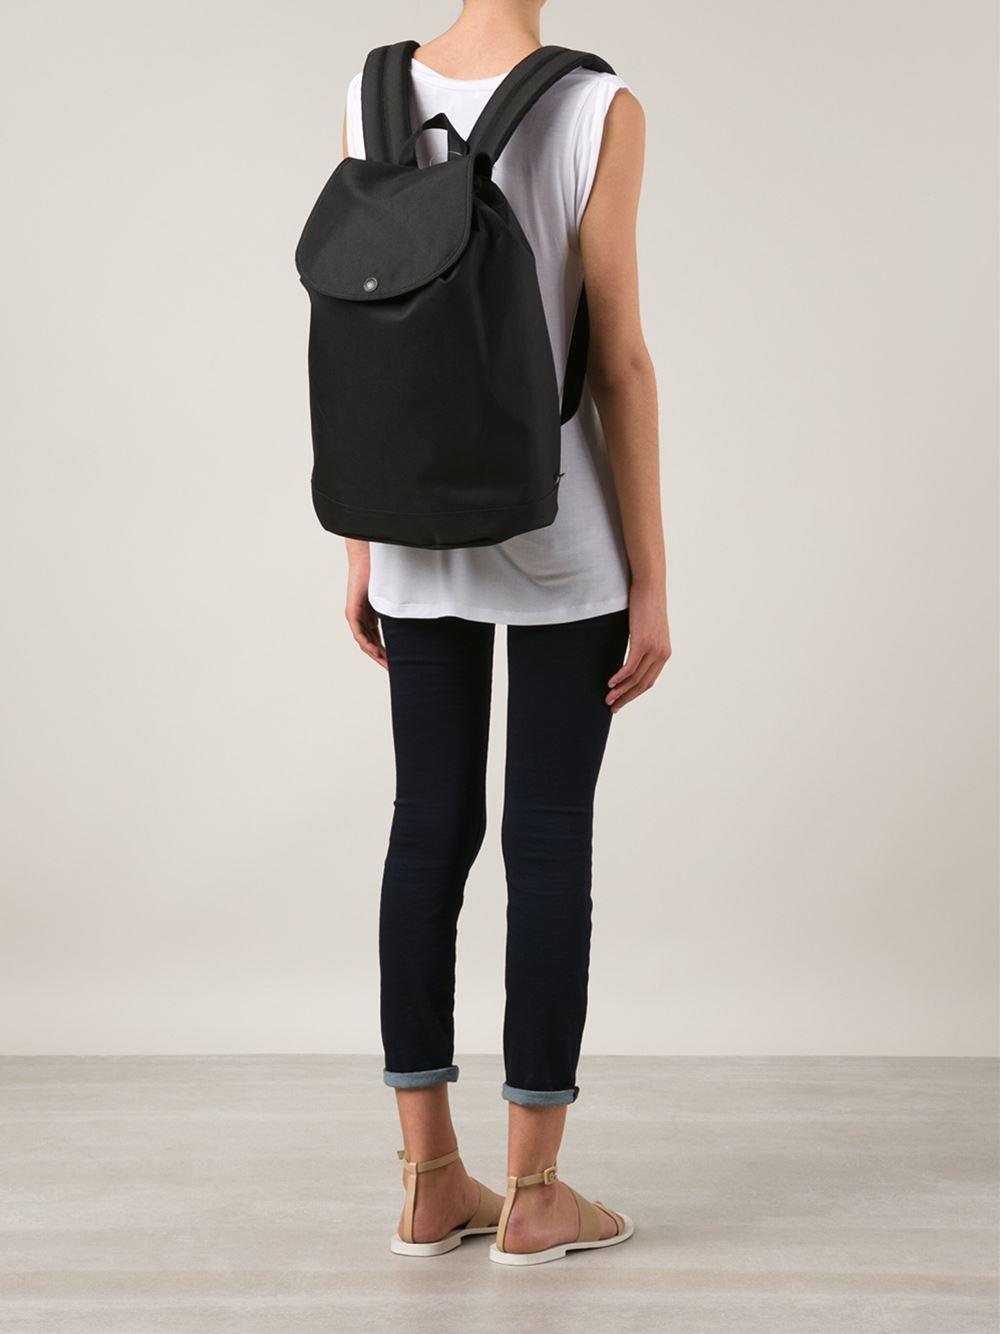 2f408c9d6fd Herschel Supply Co.  Reid  Backpack in Black for Men - Lyst